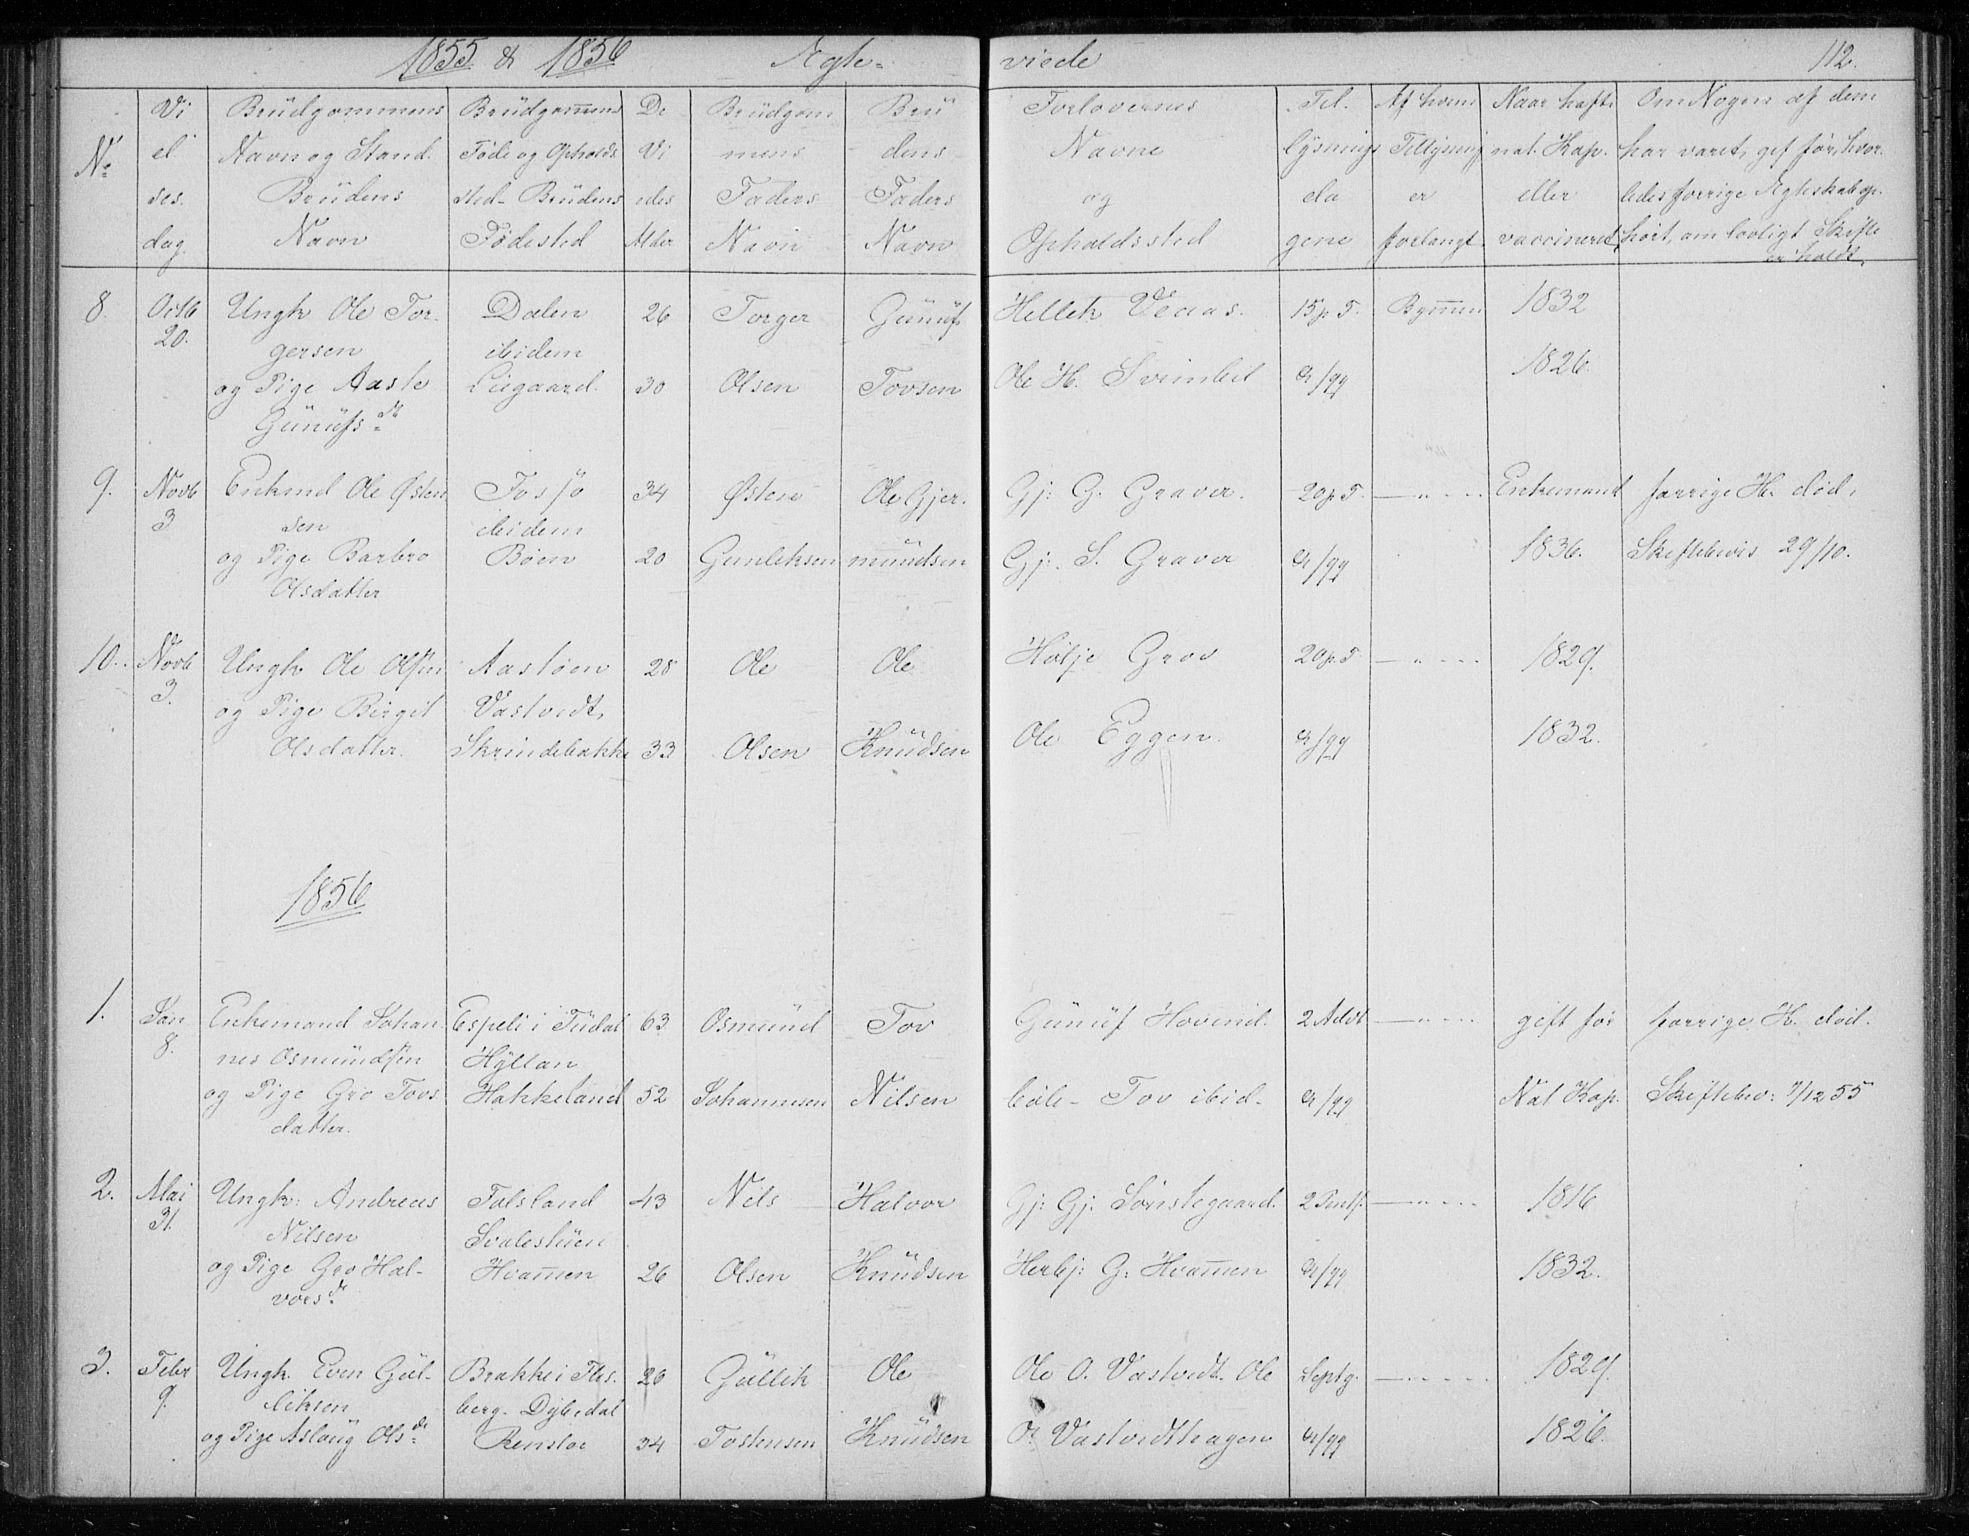 SAKO, Gransherad kirkebøker, F/Fb/L0003: Ministerialbok nr. II 3, 1844-1859, s. 112